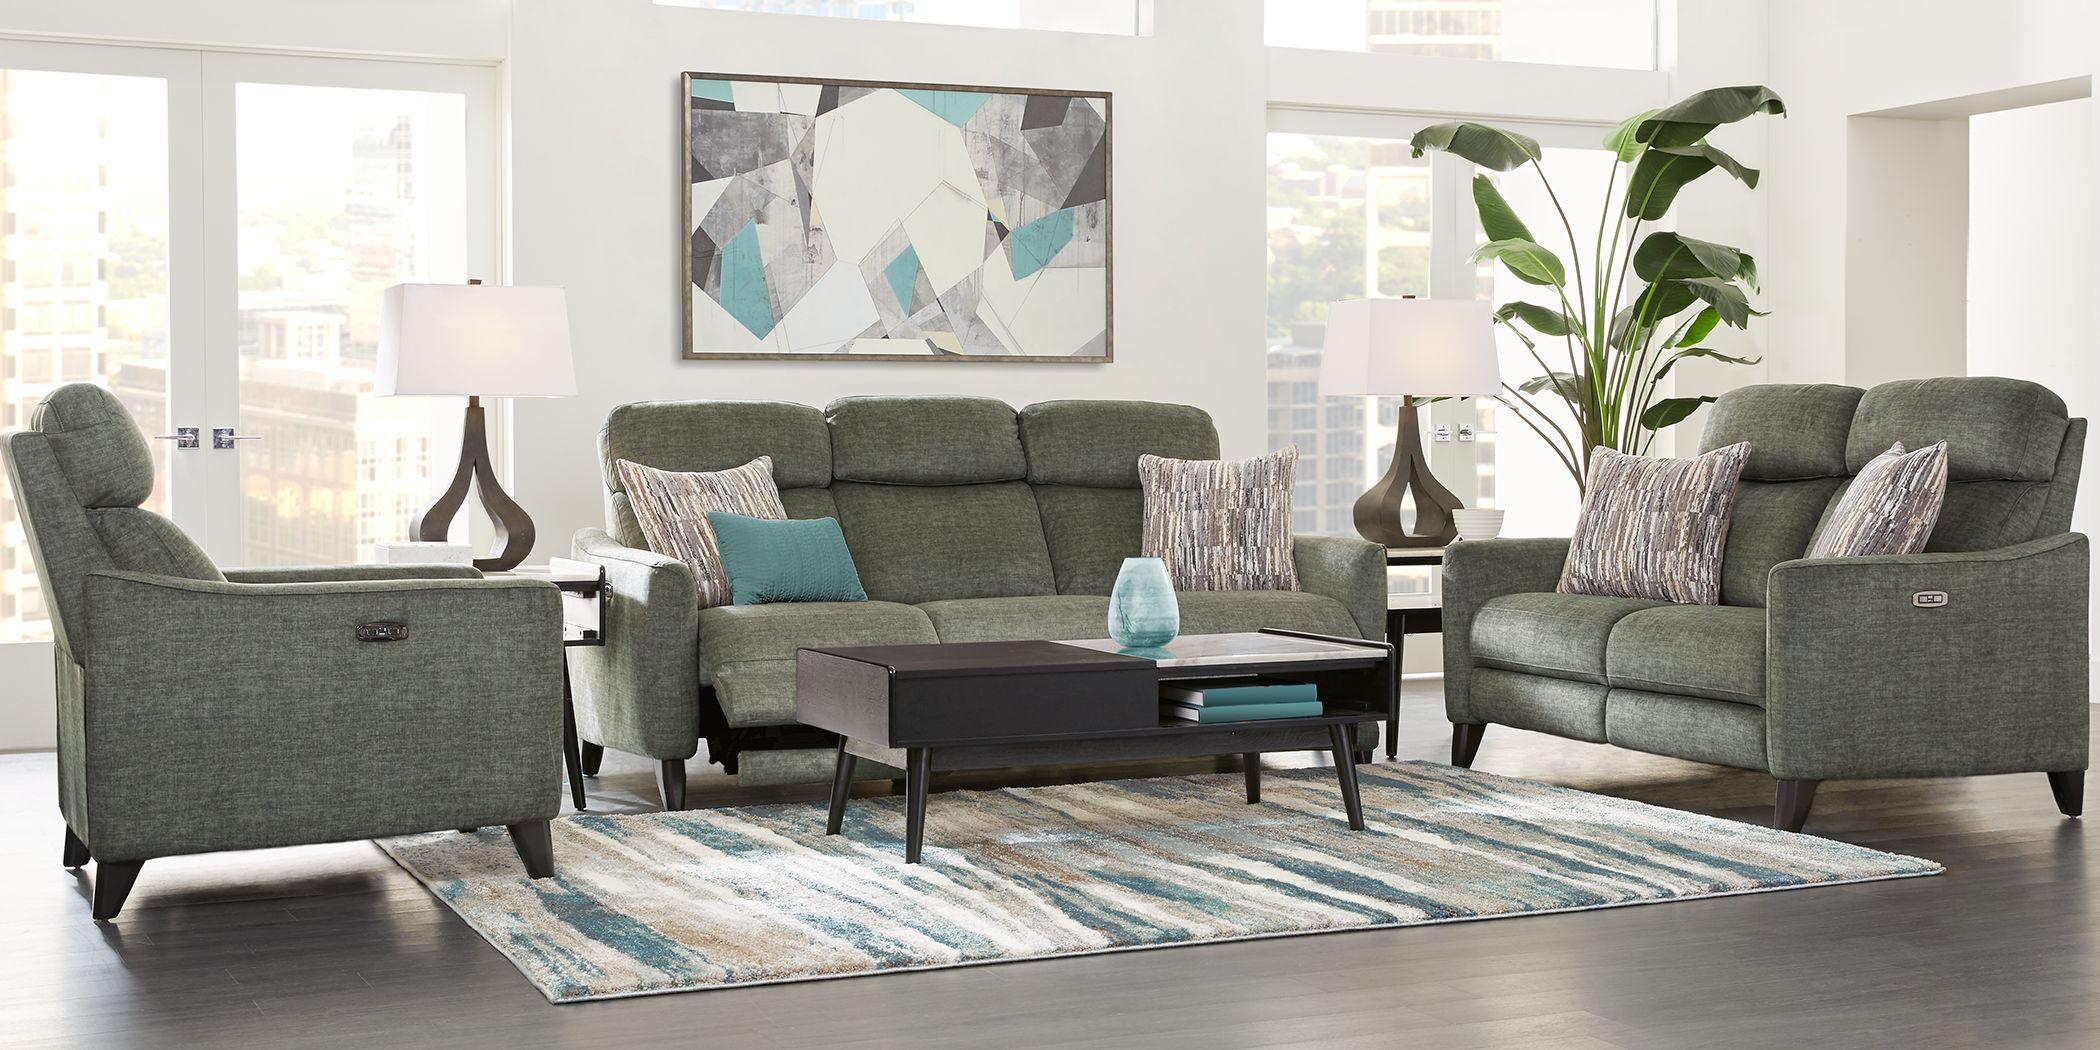 Pierceton Gray 3 Pc Dual Power Reclining Living Room In 2021 Reclining Sofa Living Room Gray Living Room Design Living Room Sofa Design